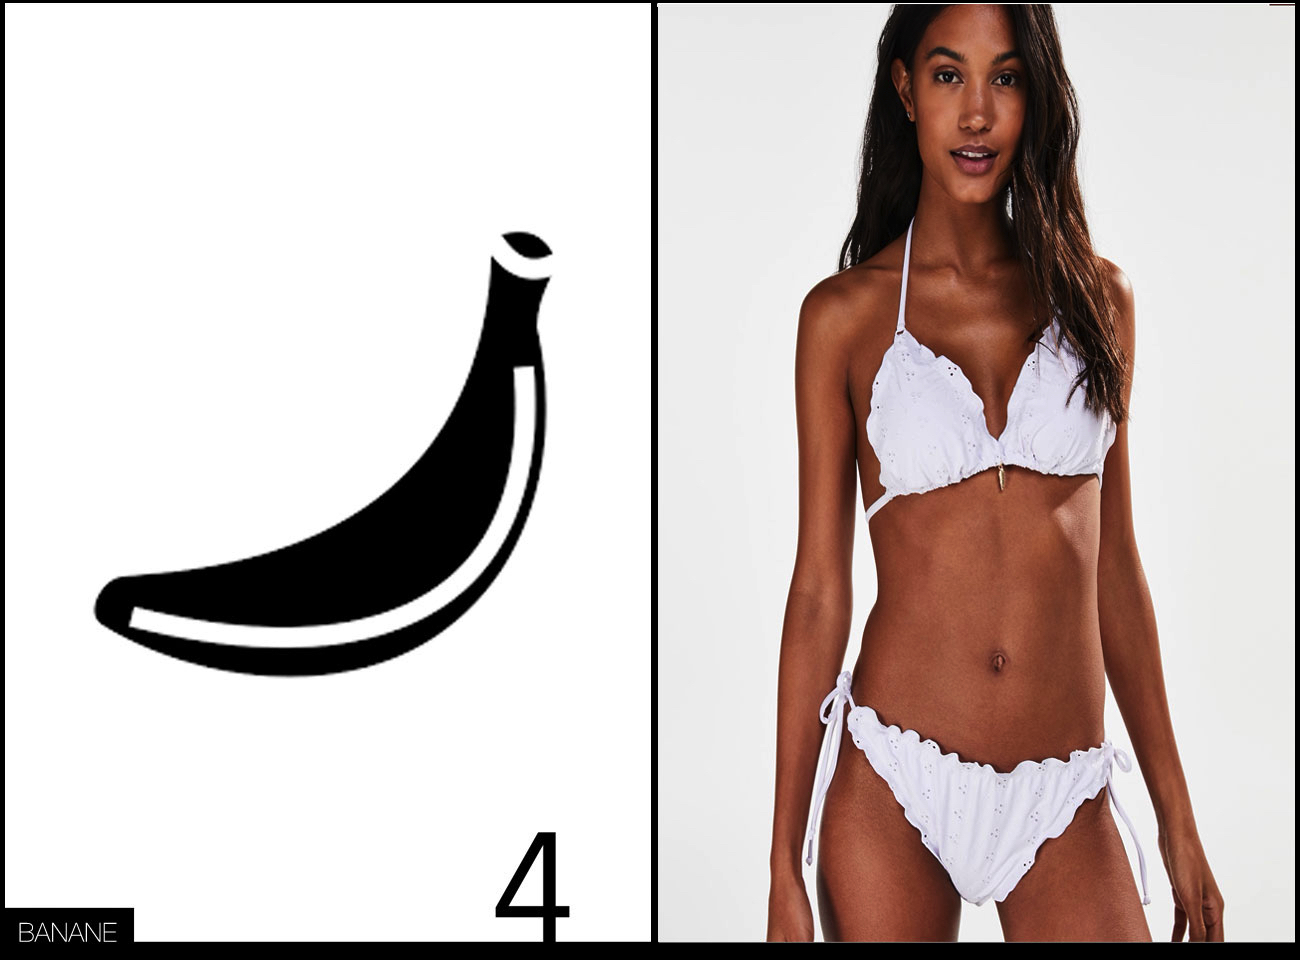 Bikini Bademode für Bananen Figur